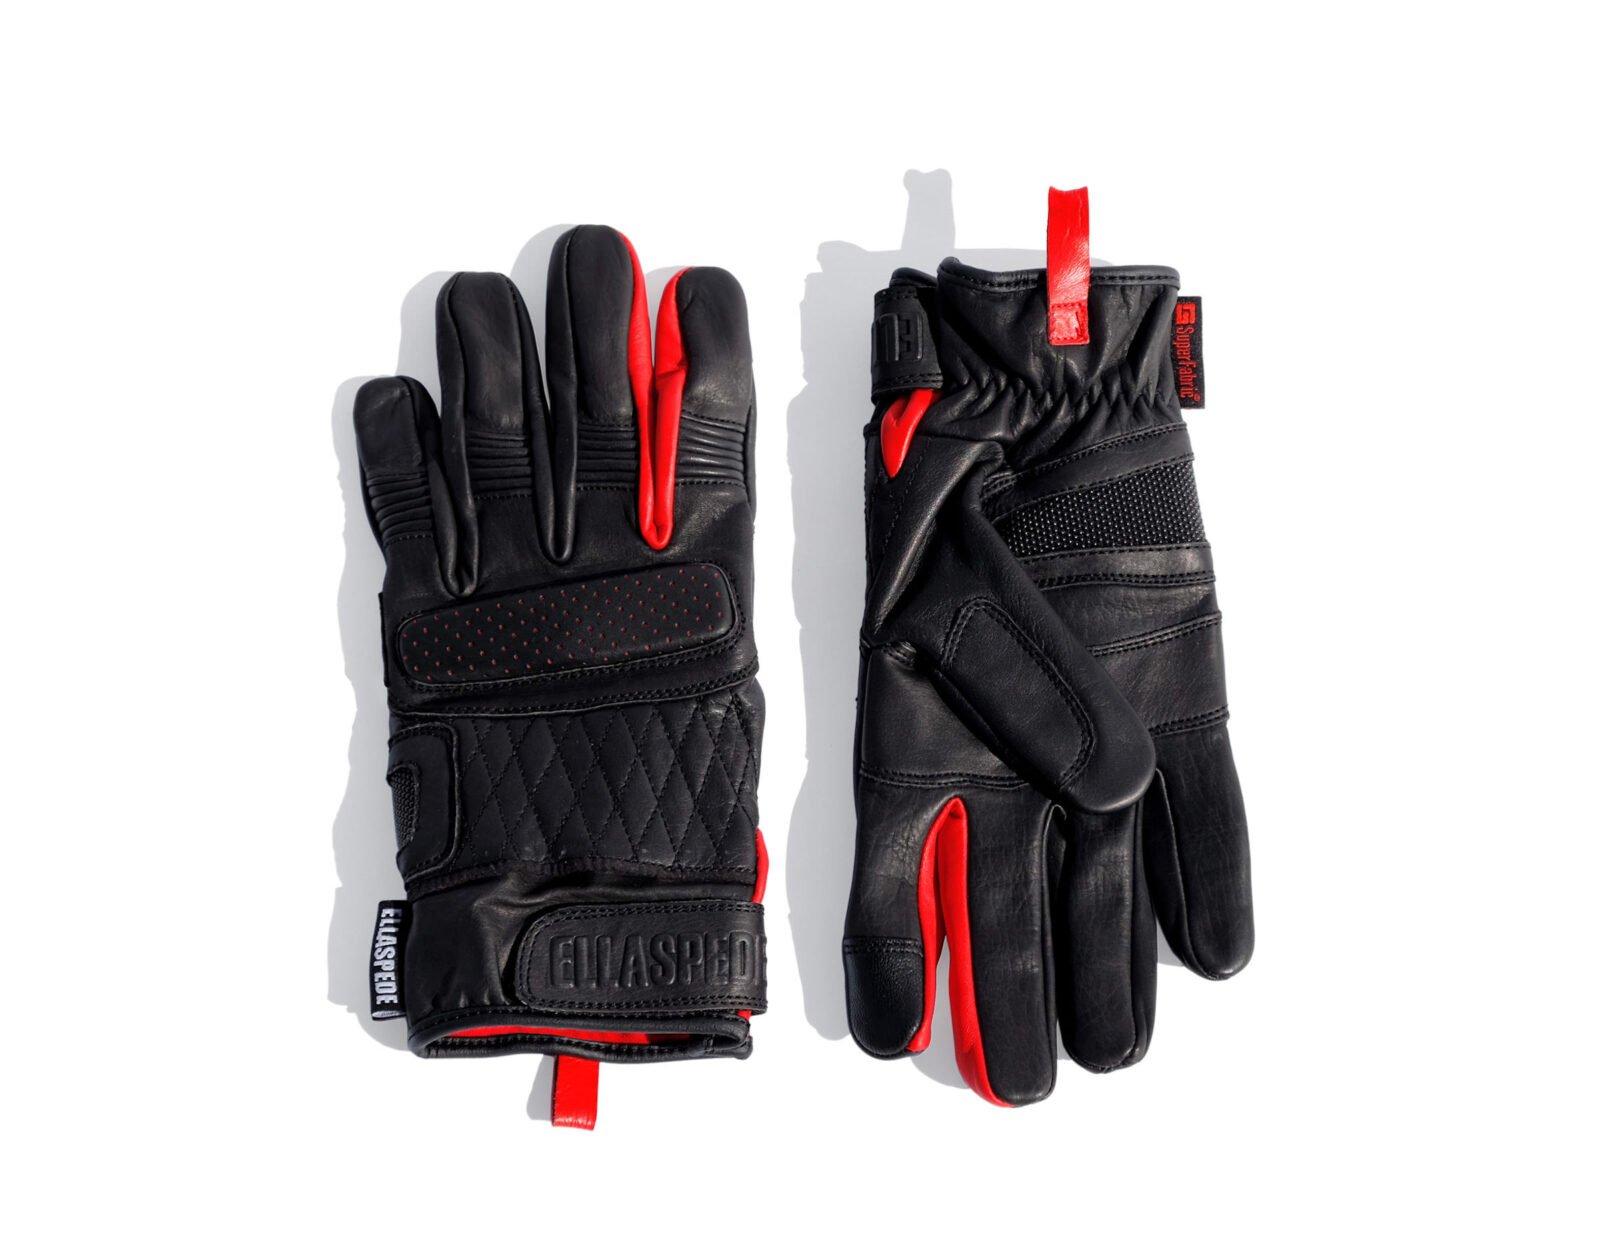 Ellaspede Road Gloves 3 1600x1235 - Ellaspede Road Gloves